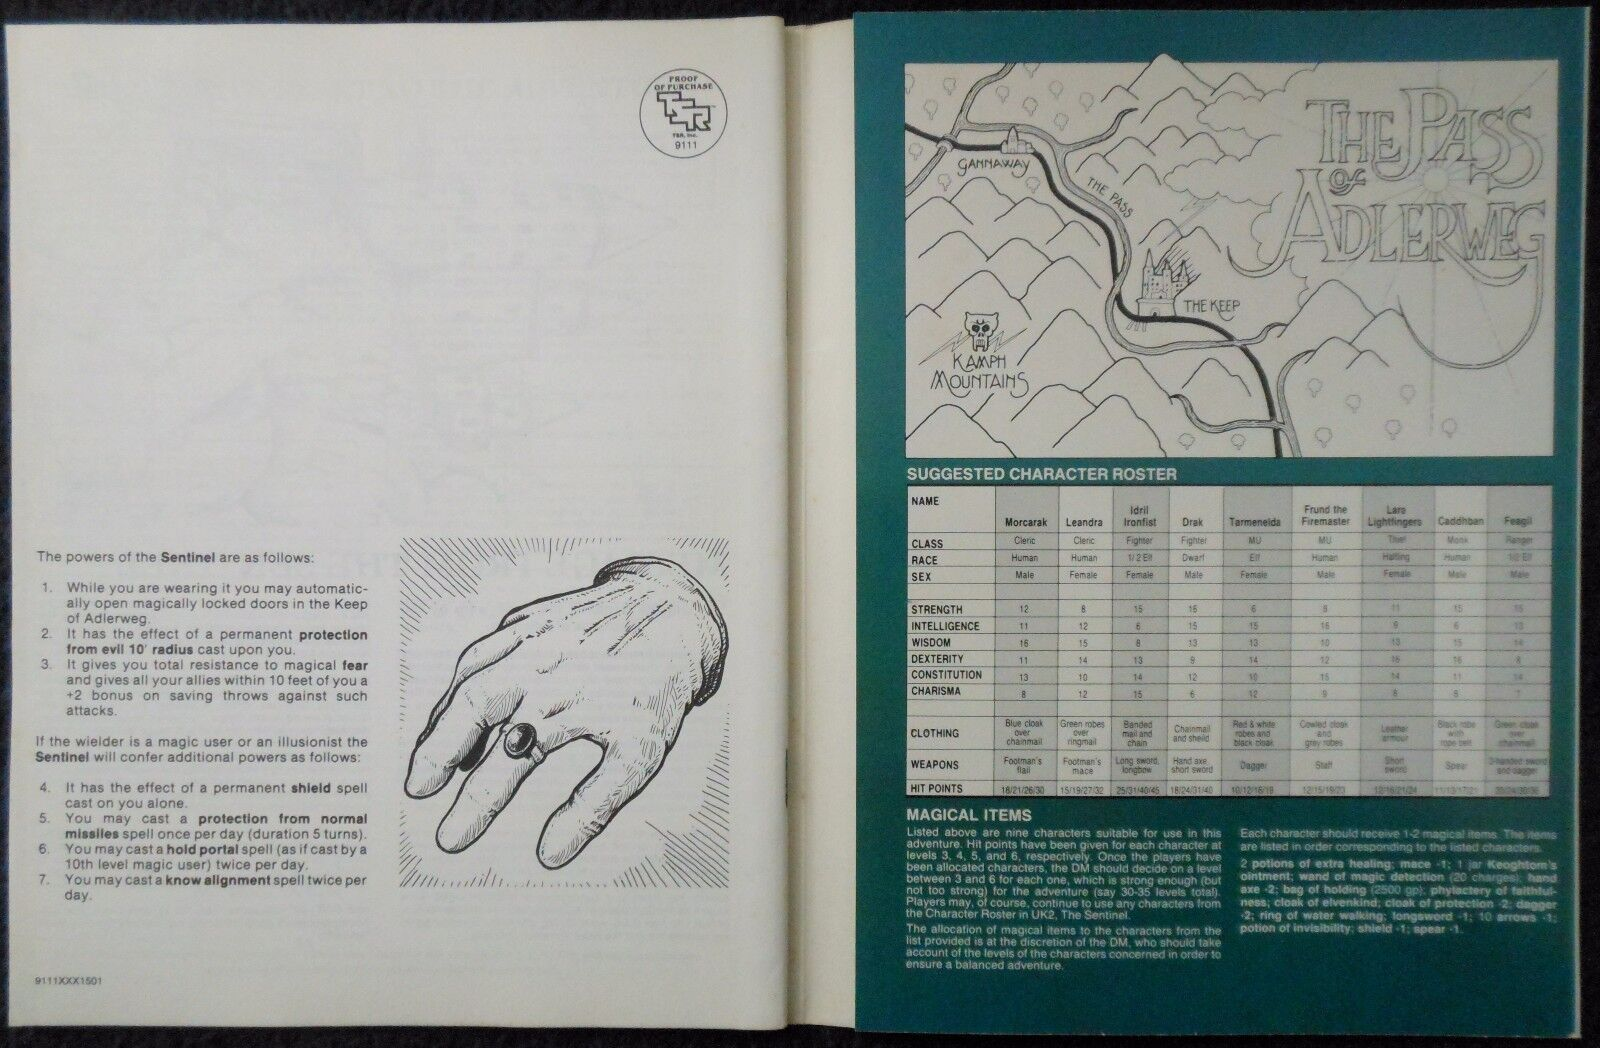 UK3 le gant gant gant advanced dungeons & dragons adventure module d&d rpg game 9111 adda2f